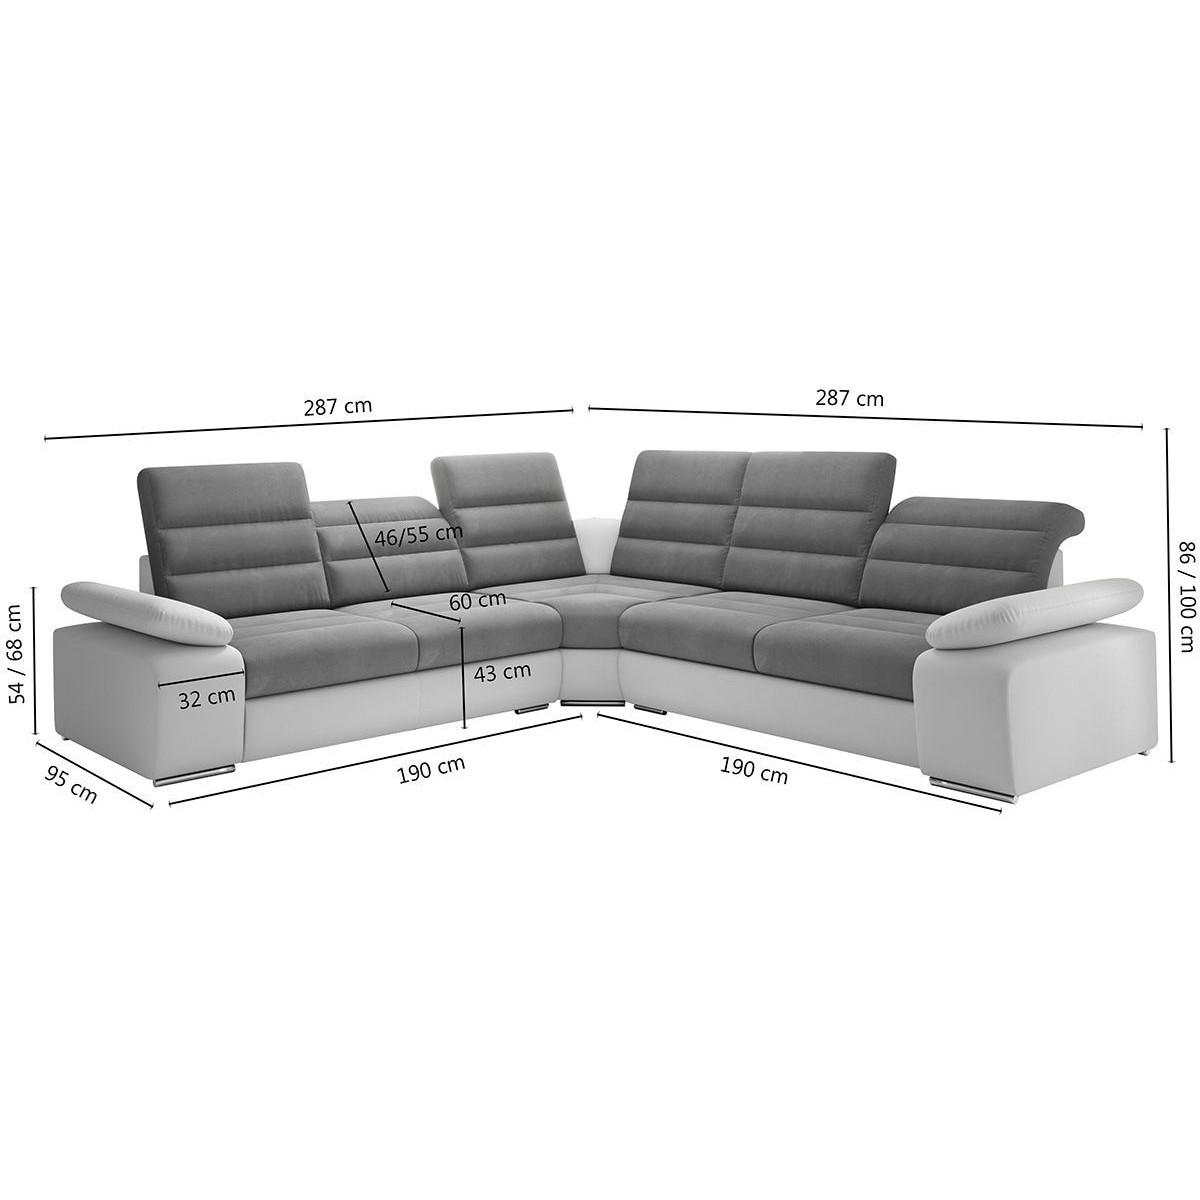 Canapé Cuir Angle Convertible Salon Canapé D Angle Convertible Design En Tissu Gris Et